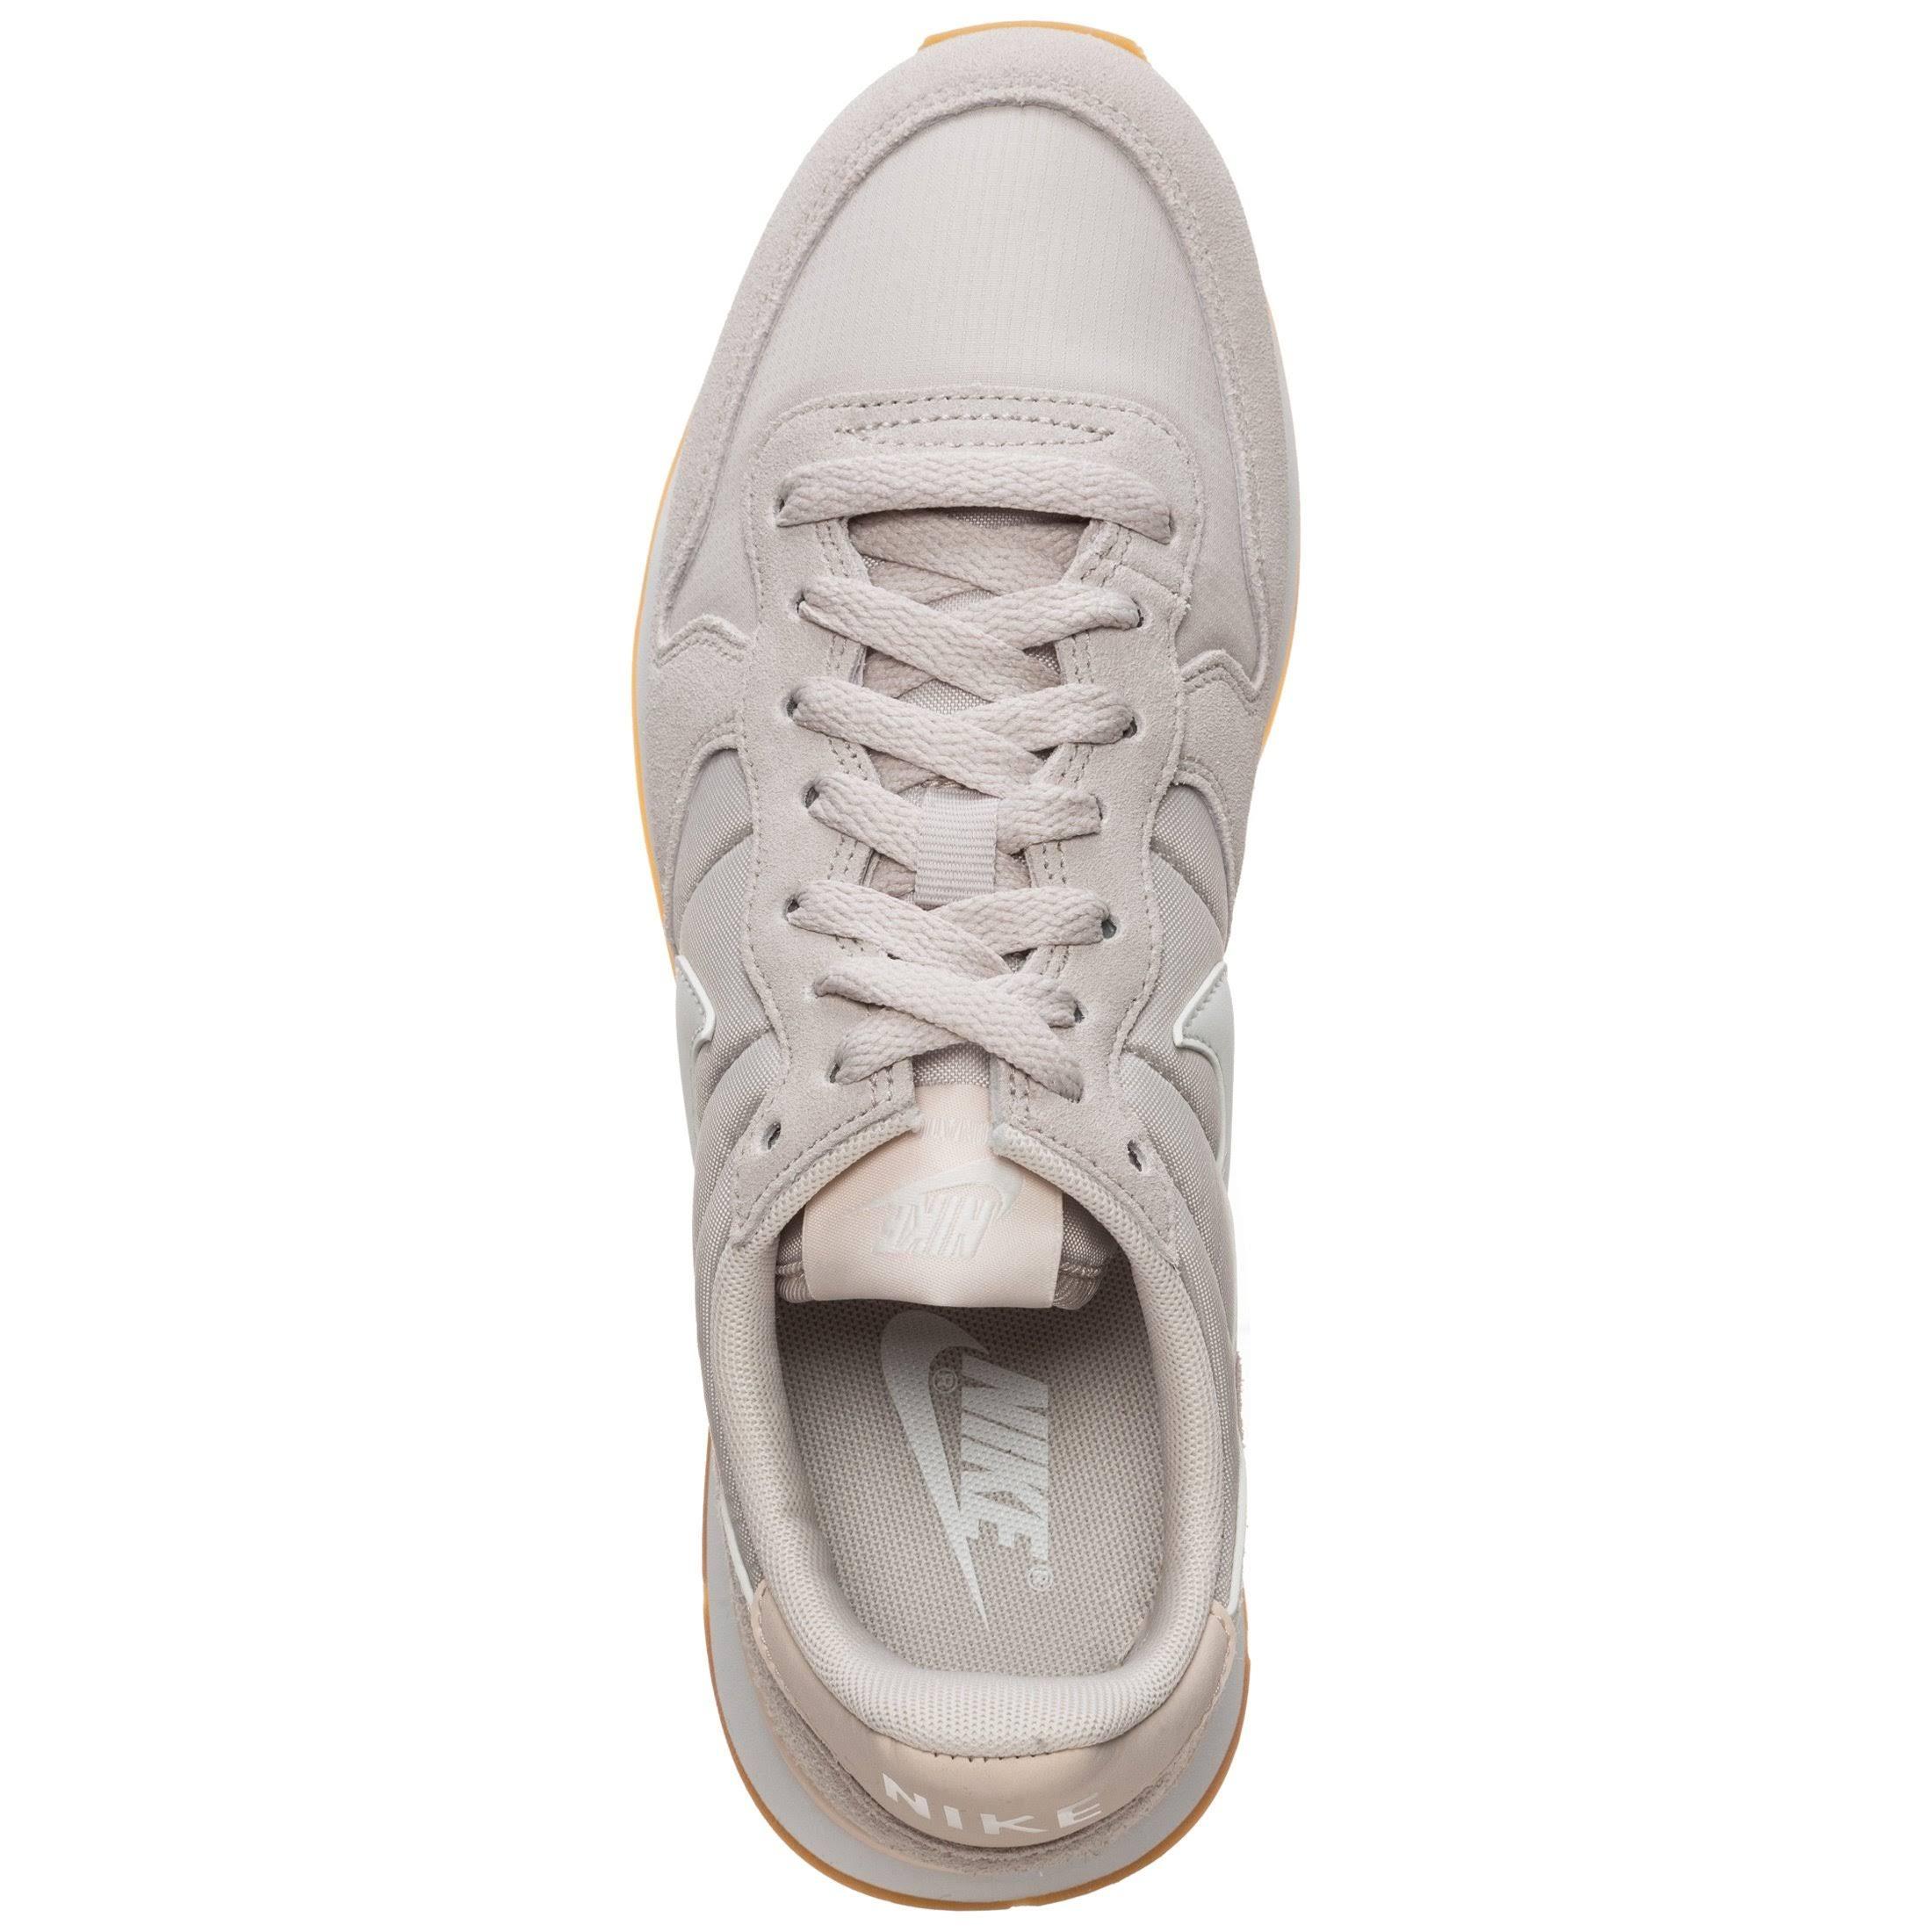 Nike Sneakers Dames Blue Beige SportswearInternationalist 9ebWE2IDHY